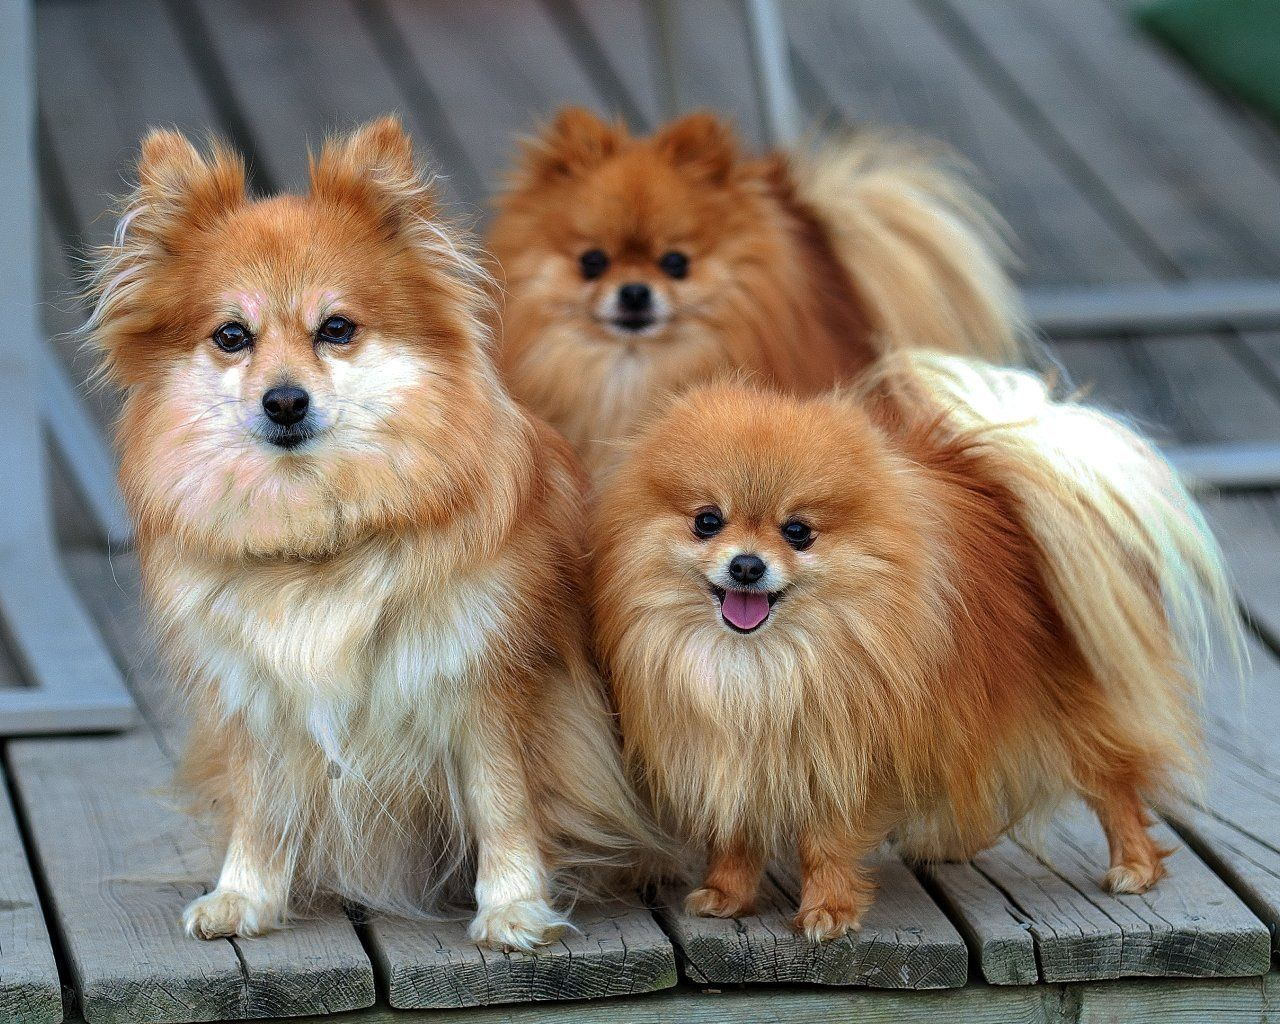 Pomeranians Wallpaper Pomeranian Pomeranian Dog Cute Puppies Images Dog Wallpaper Hd wallpaper pomeranian dog animal pet